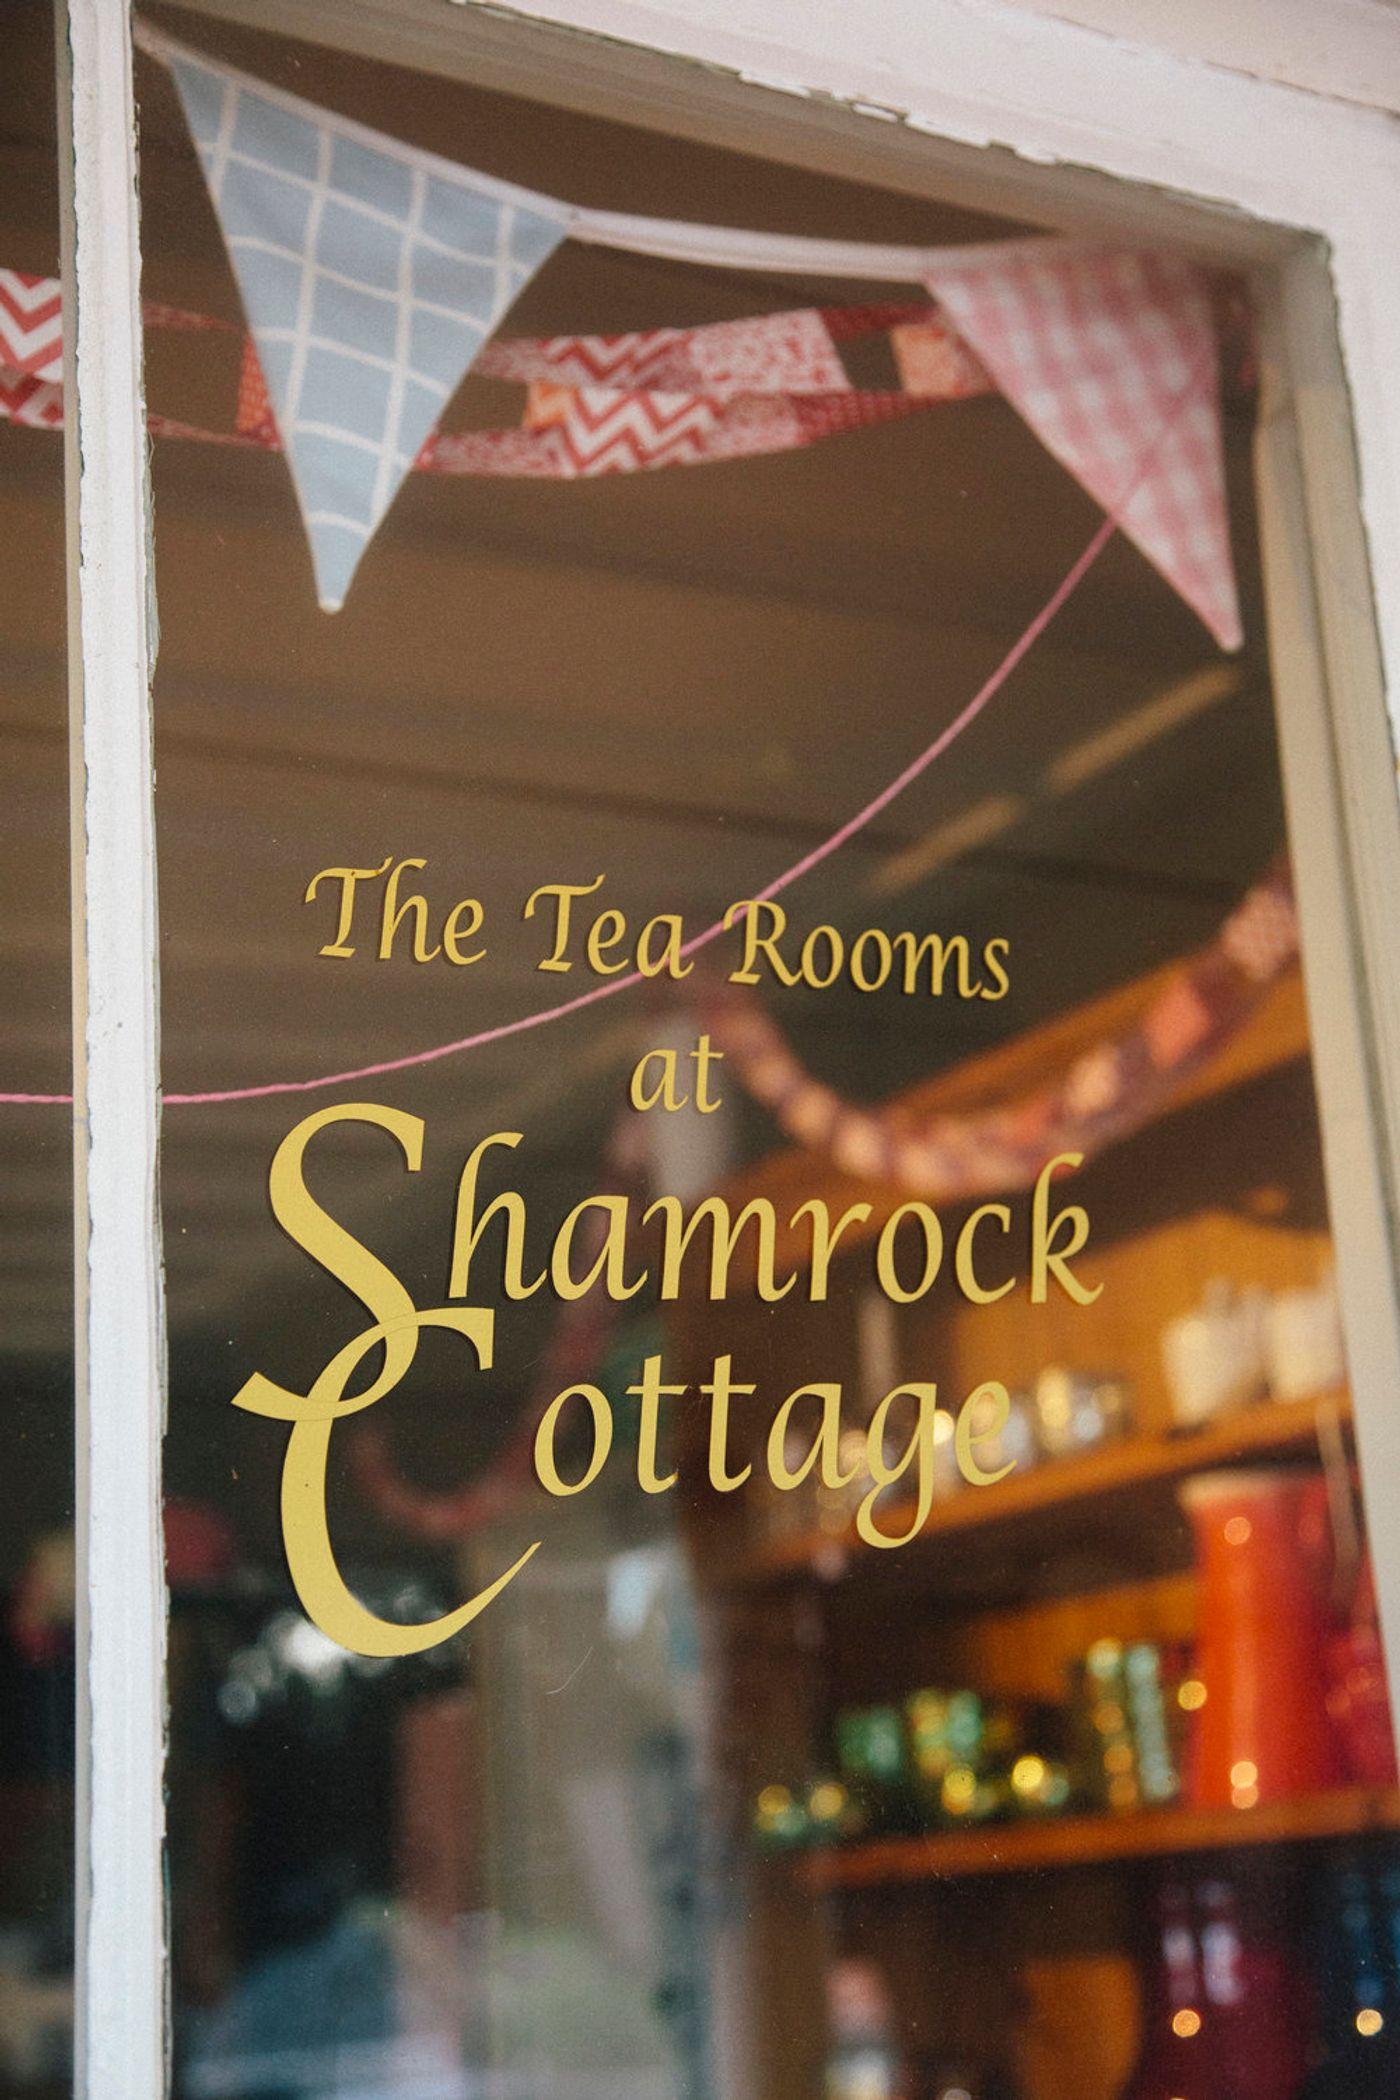 Shamrock cottage vinyl graphic on window